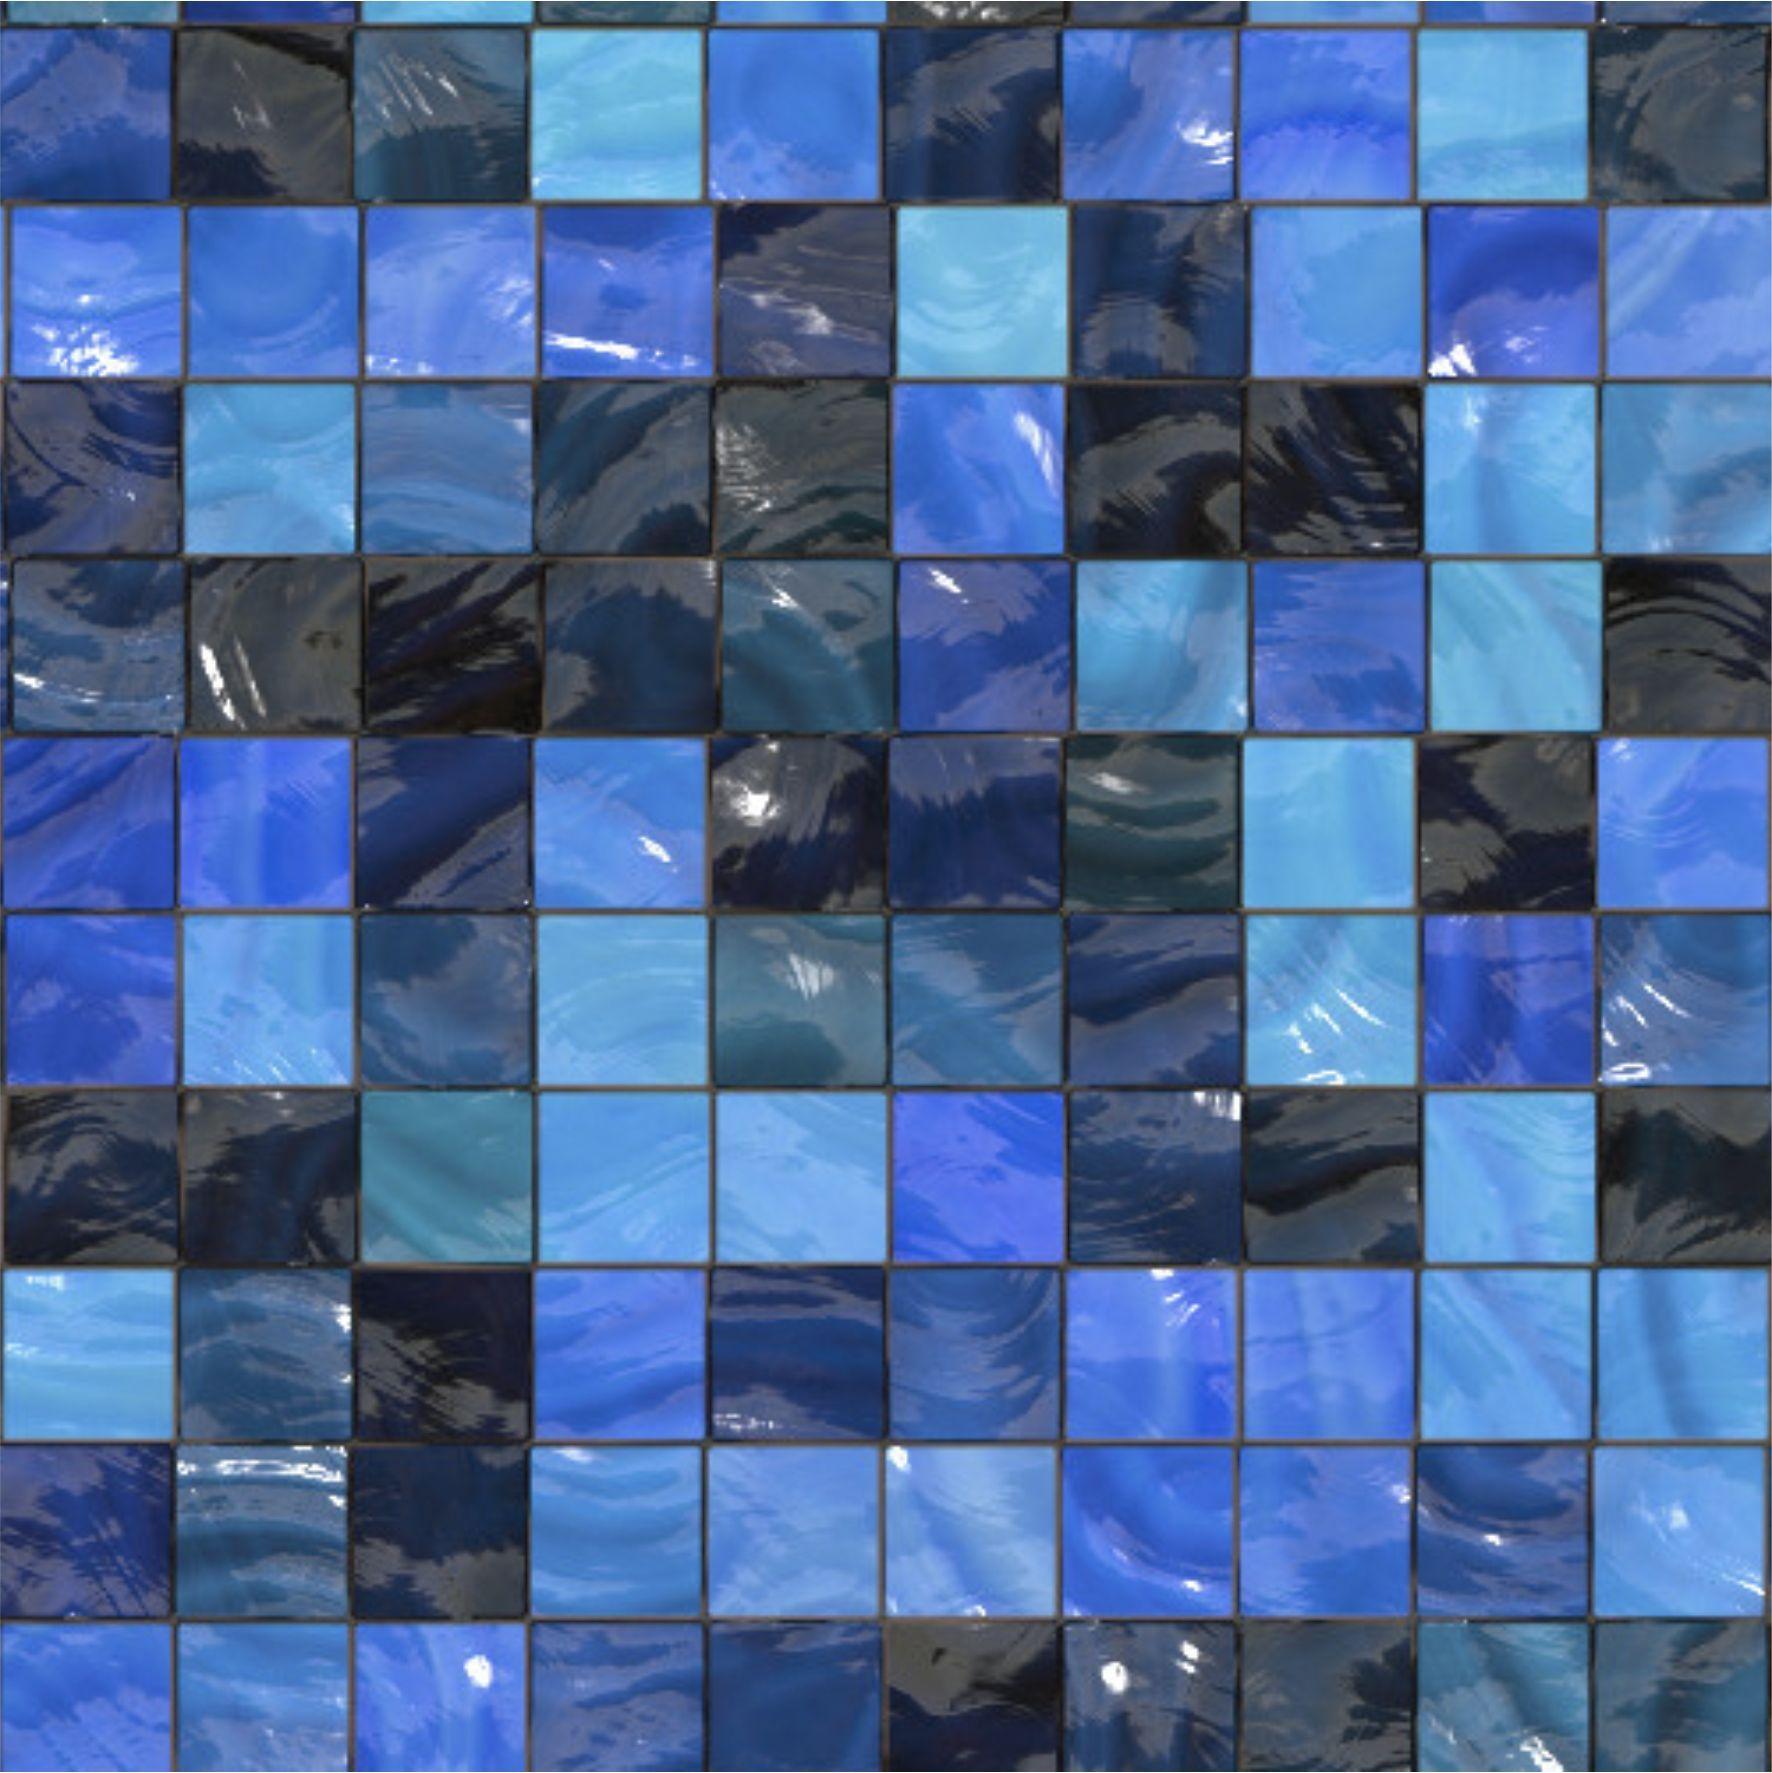 Kit Adesivo Pastilha Azul Frete Grátis On The UAU Adesivos #1F6FAC 1772x1773 Banheiro Azul Pastilha